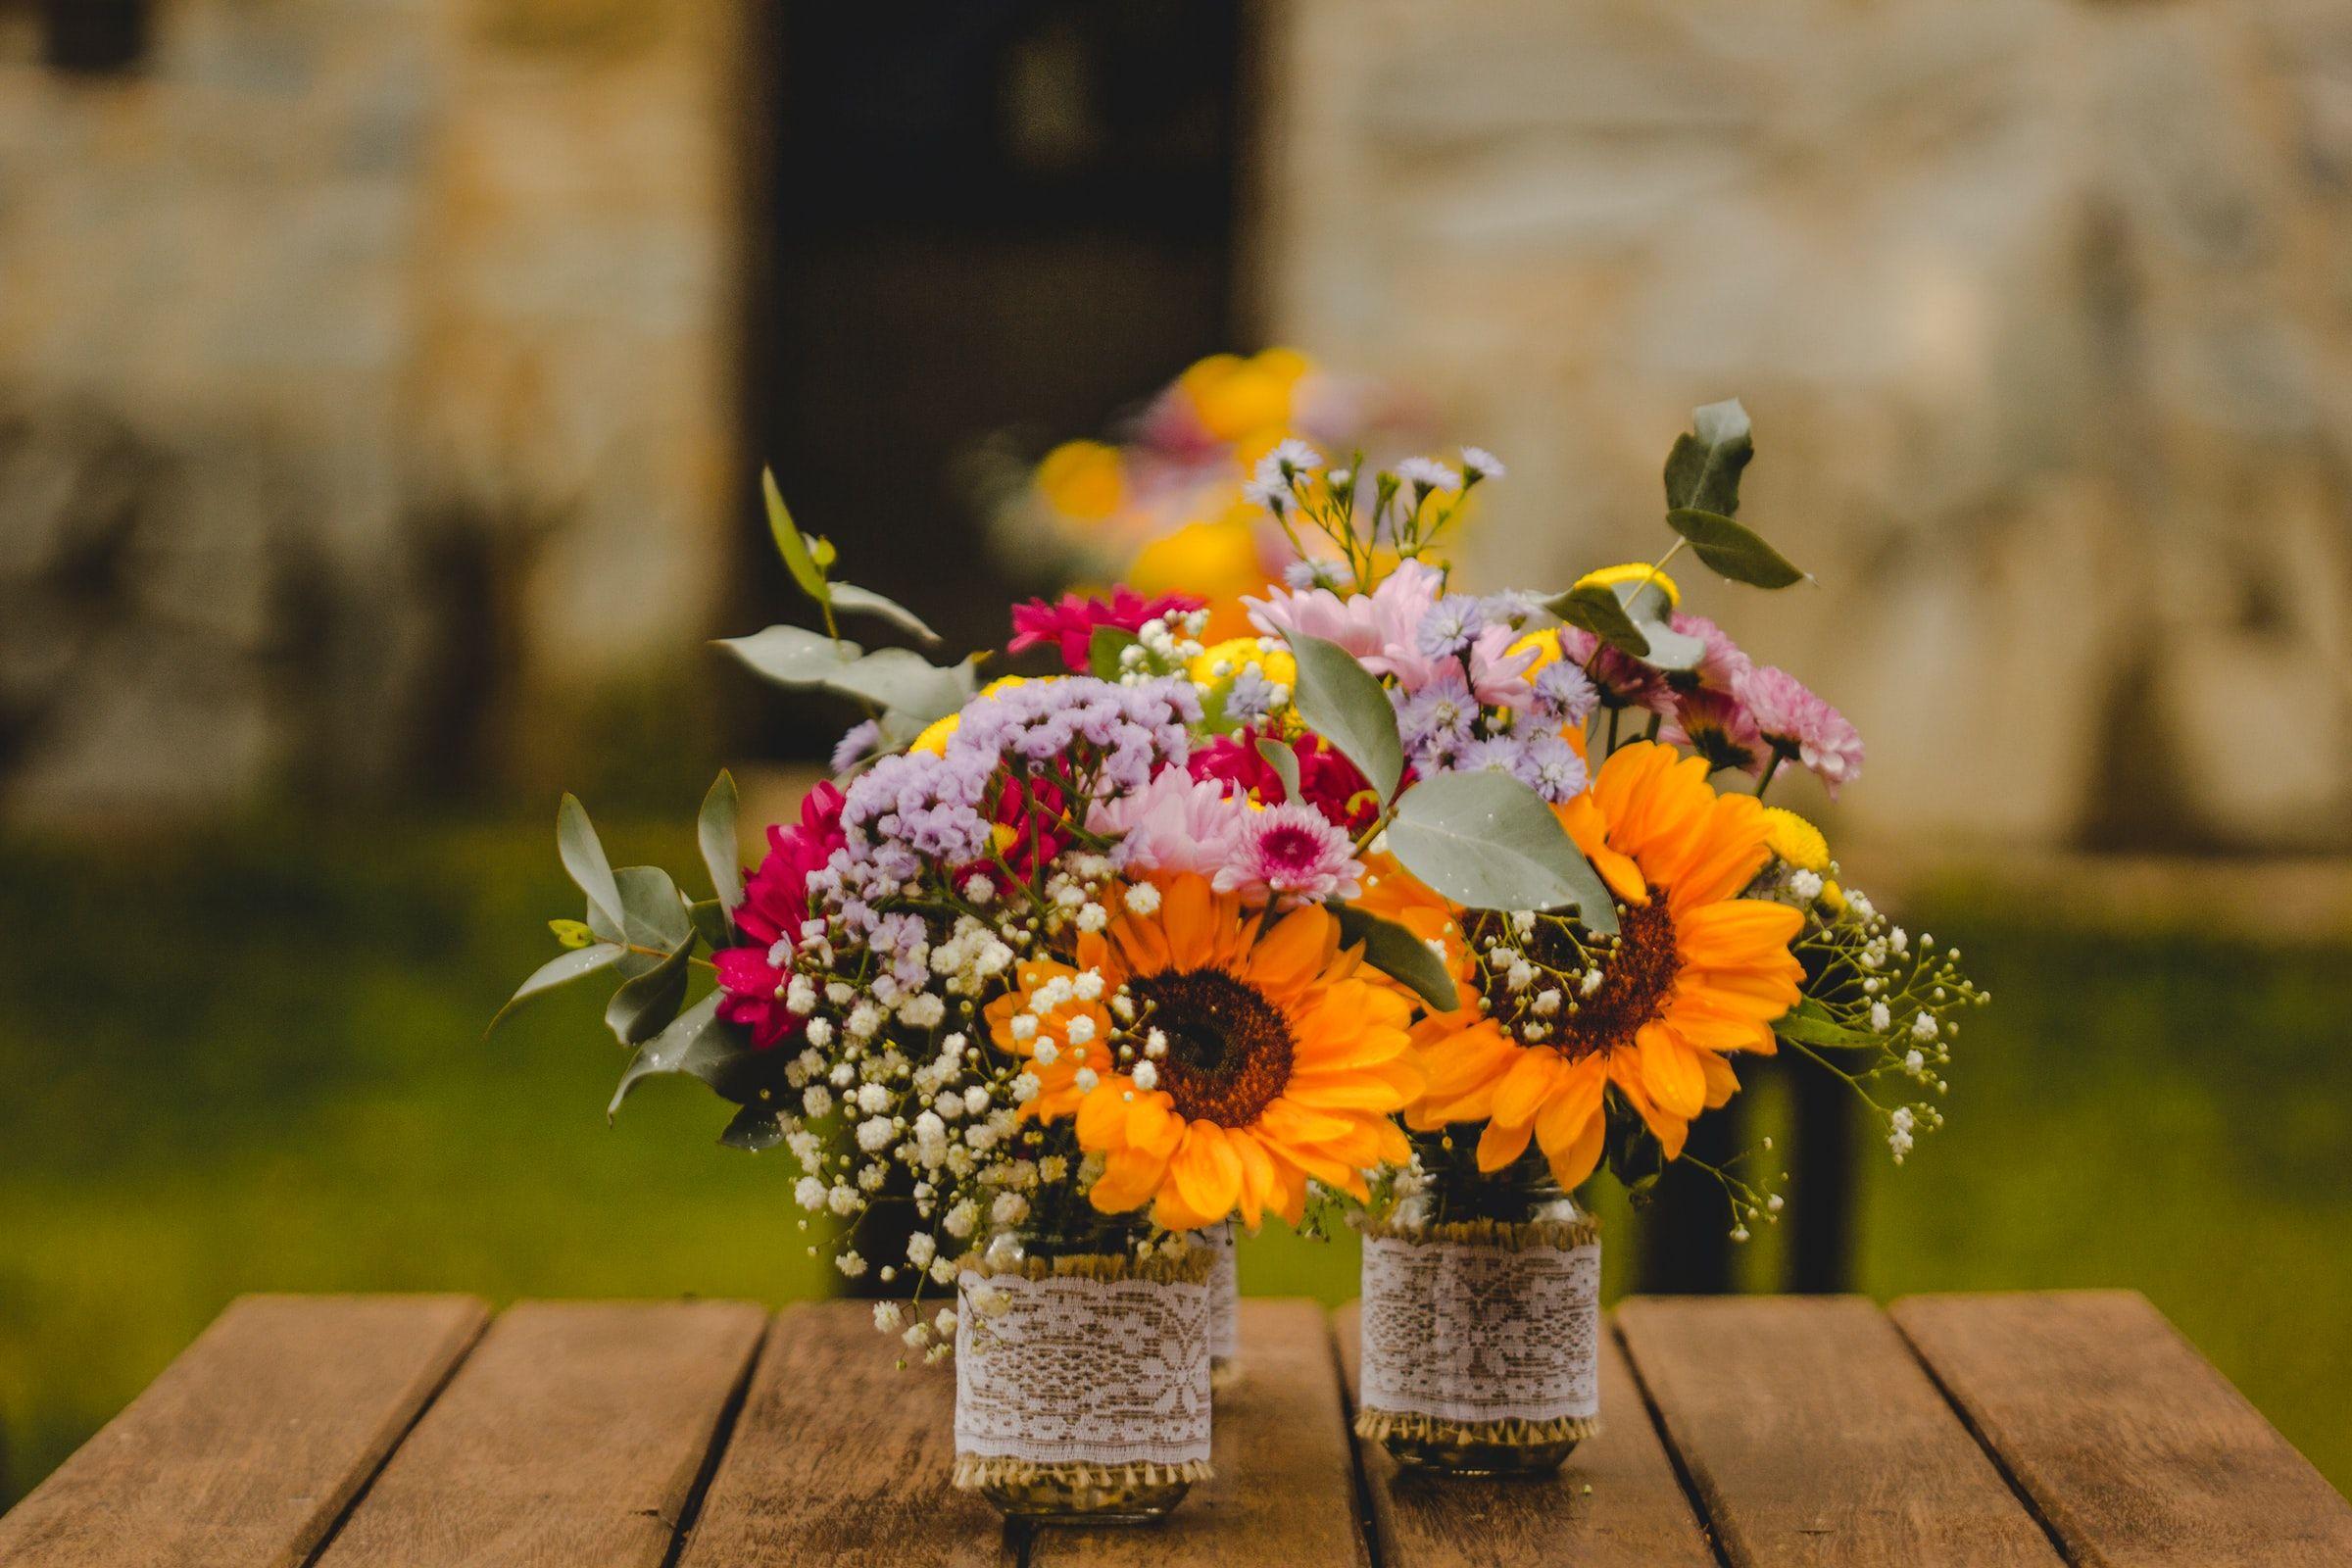 fresh blooms to brighten your day